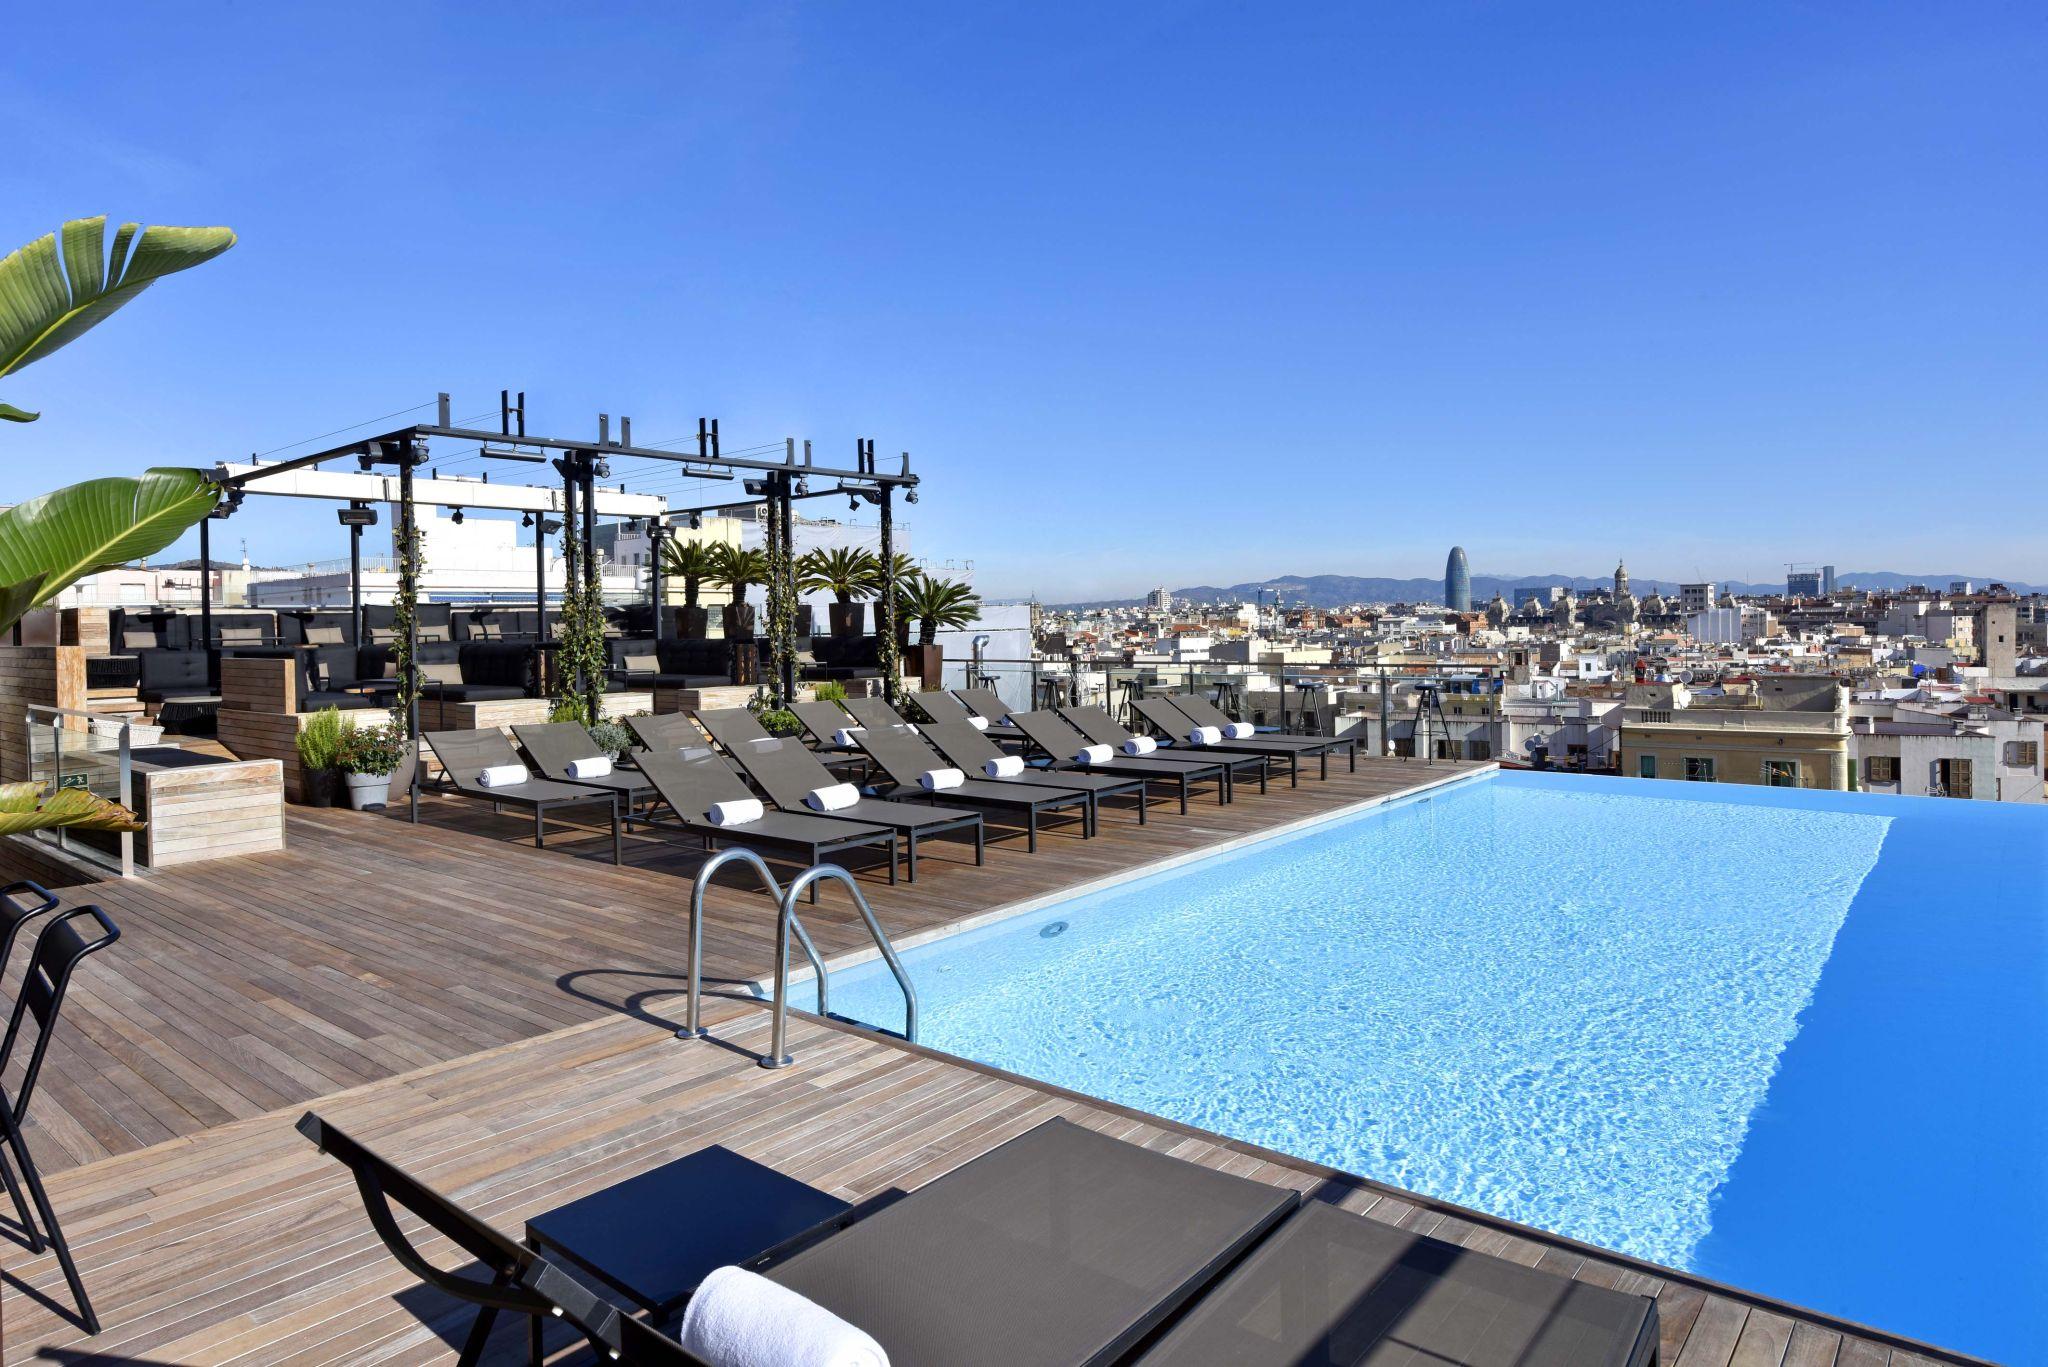 Swimming Pool Barcelona Directory Barcelona Home